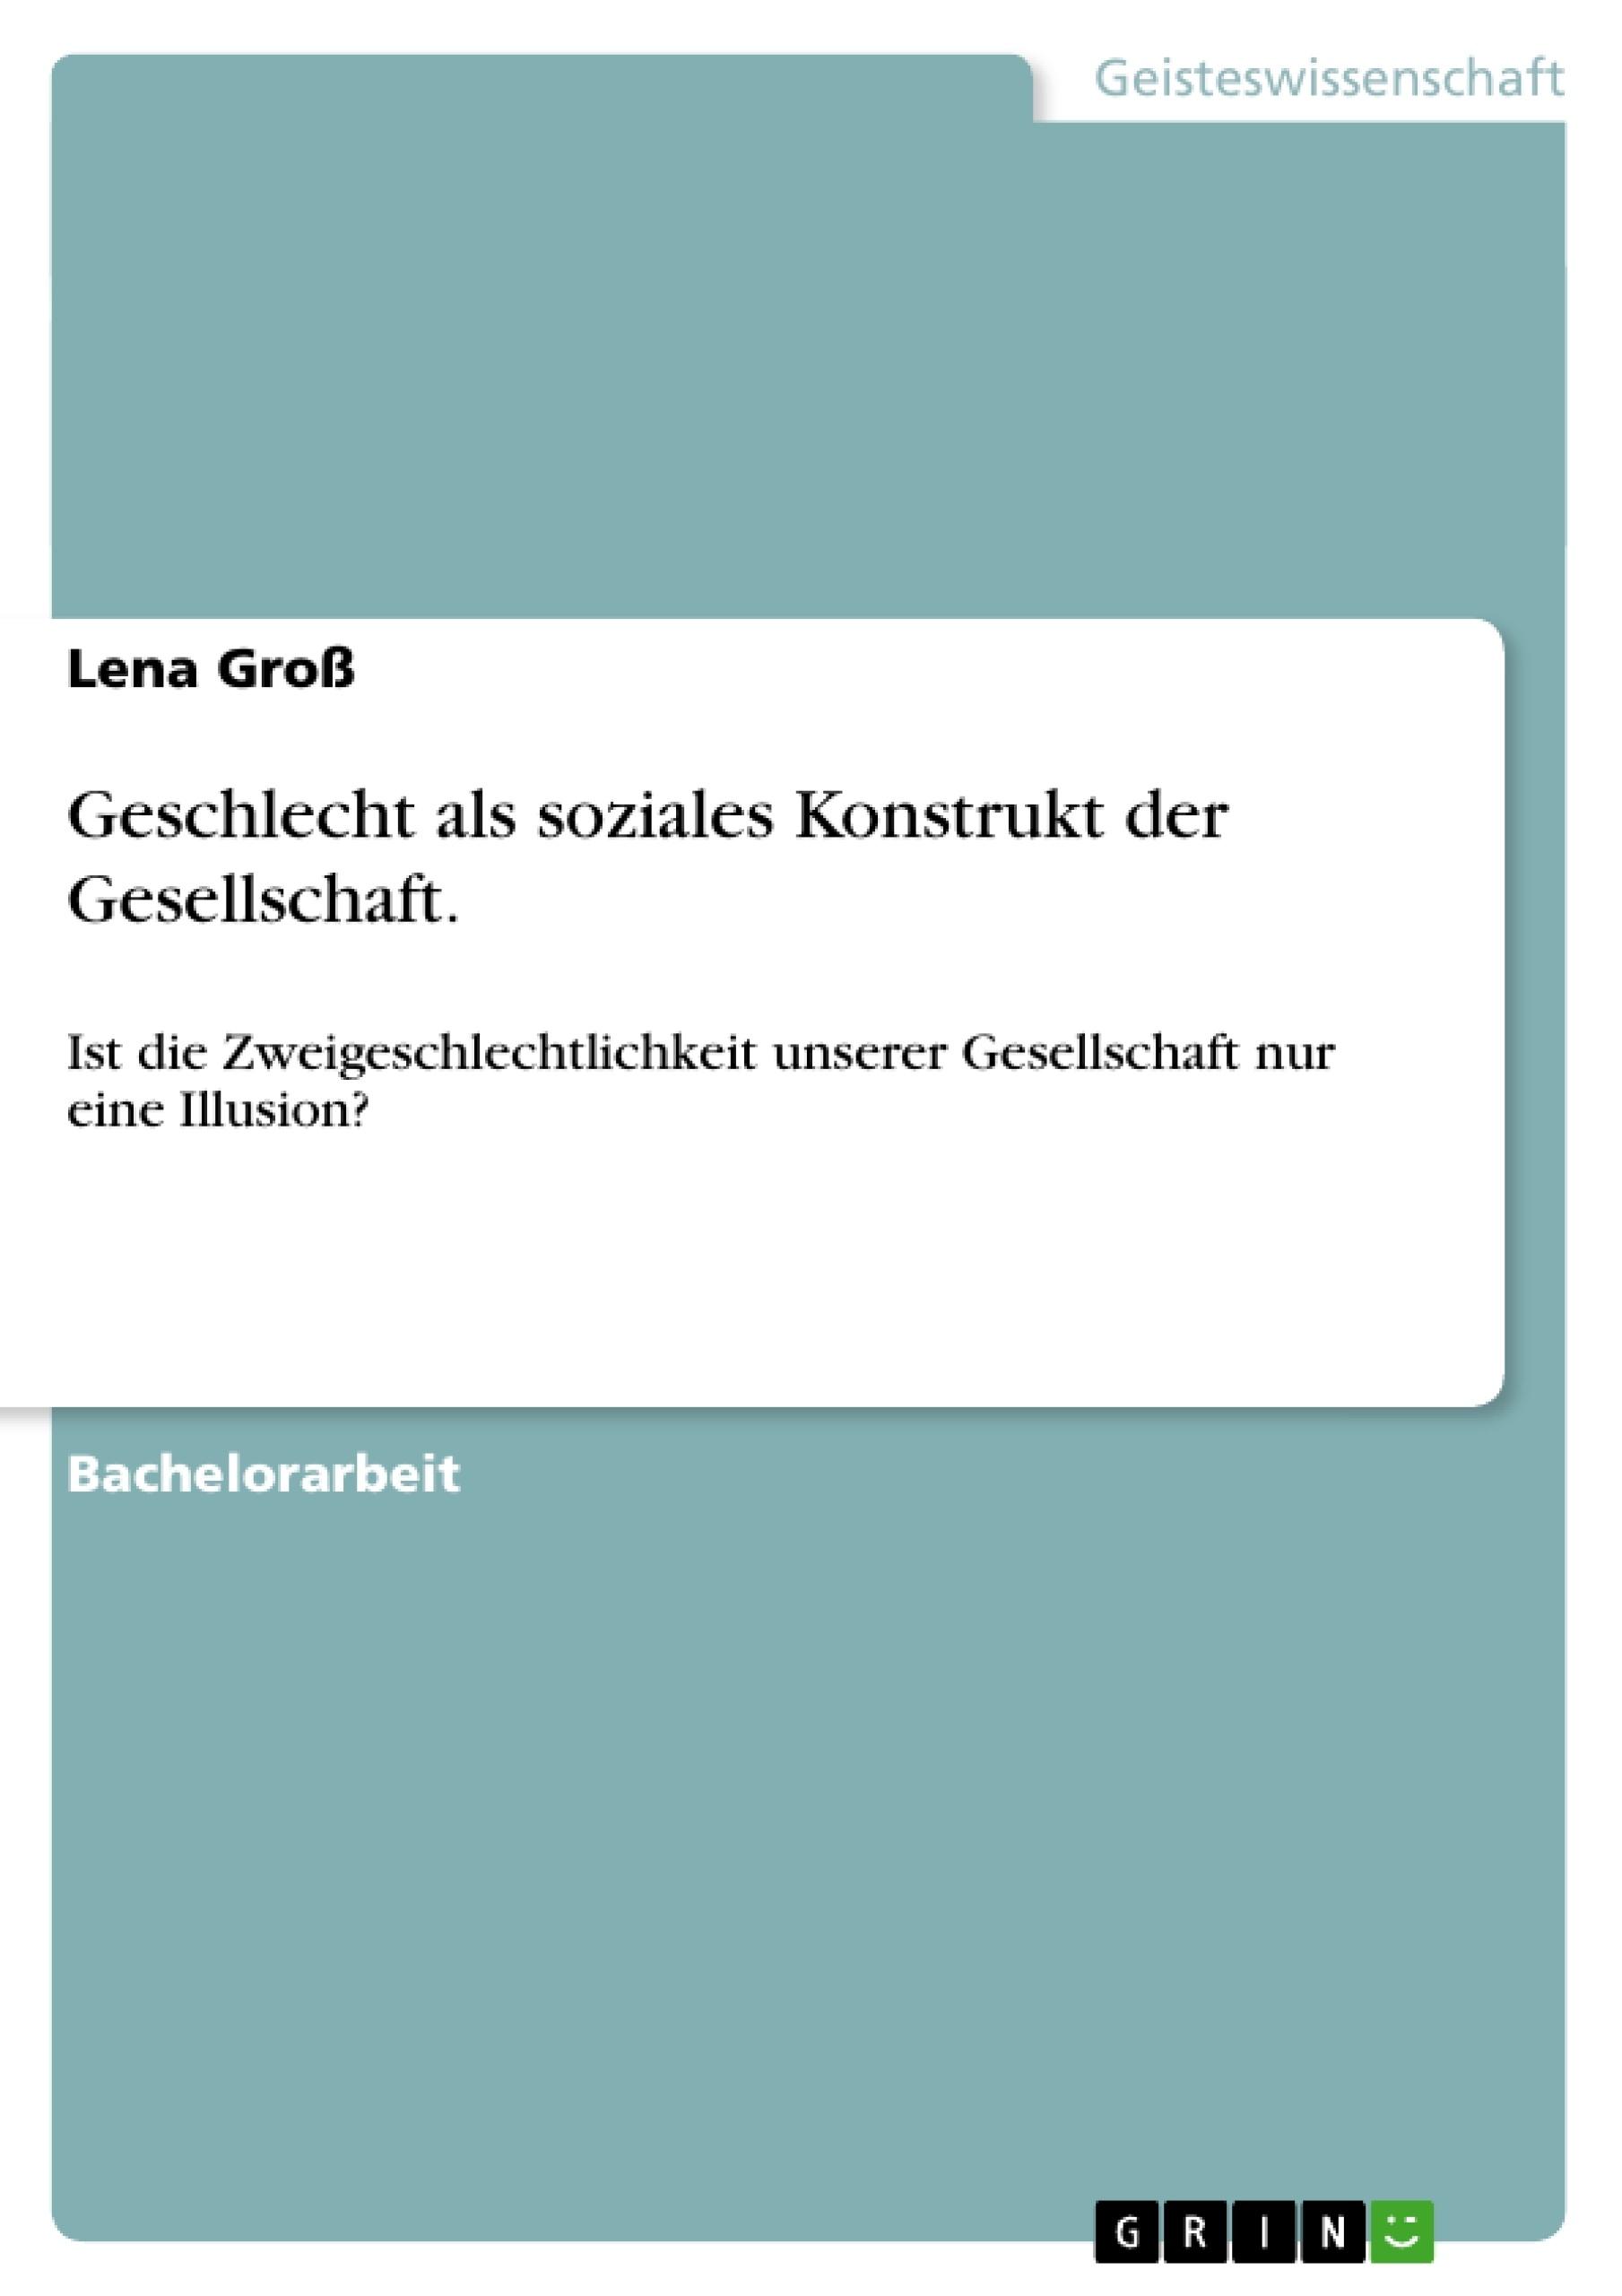 Titel: Geschlecht als soziales Konstrukt der Gesellschaft.